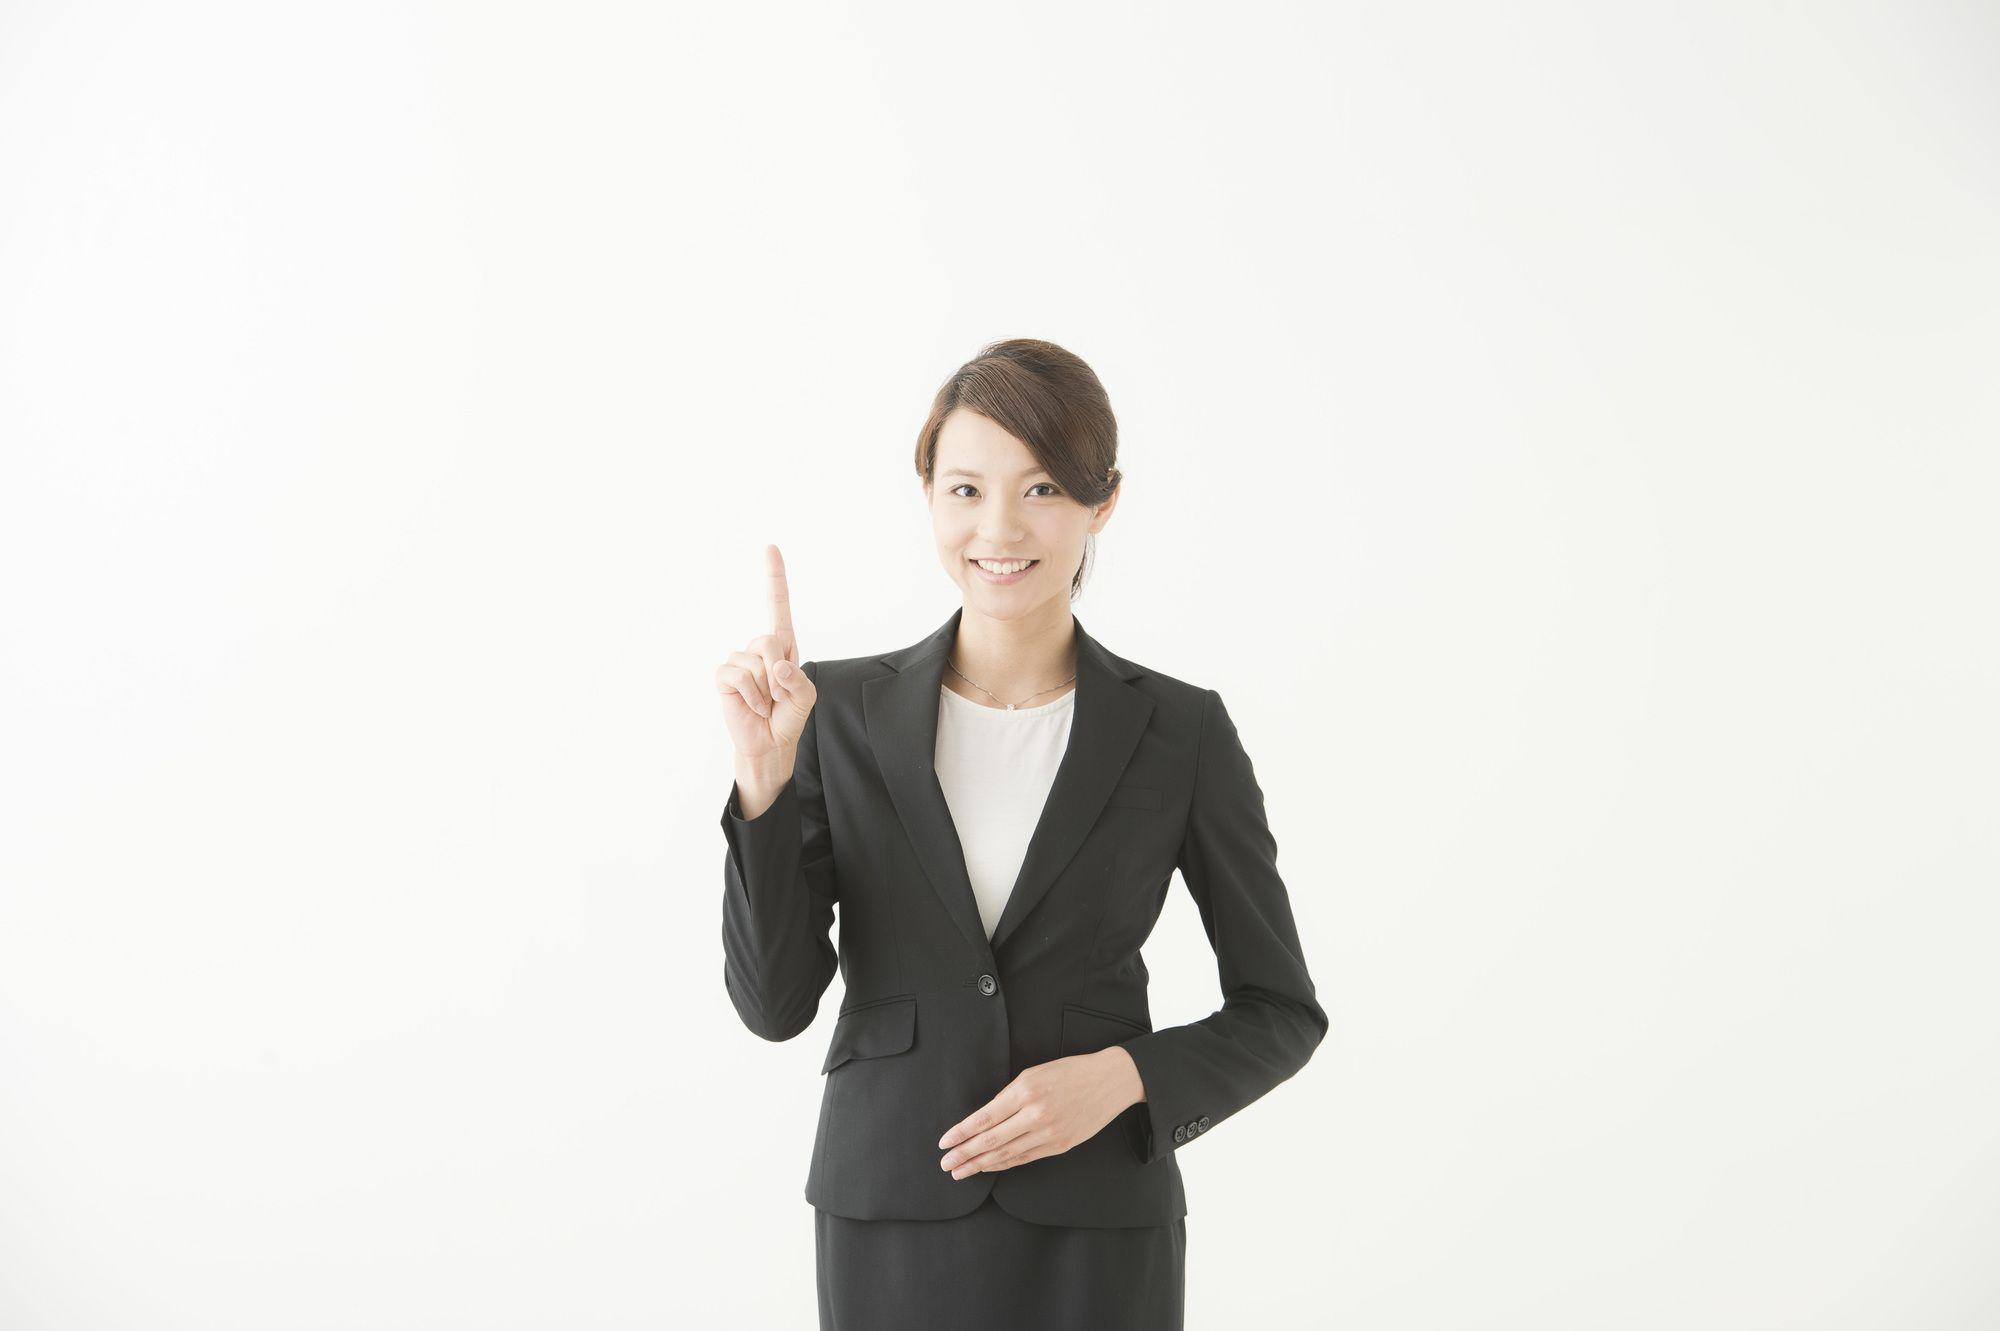 "<span class=""title"">企業名簿を効率的に集めるならリスト販売業者!他の収集方法と比較</span>"